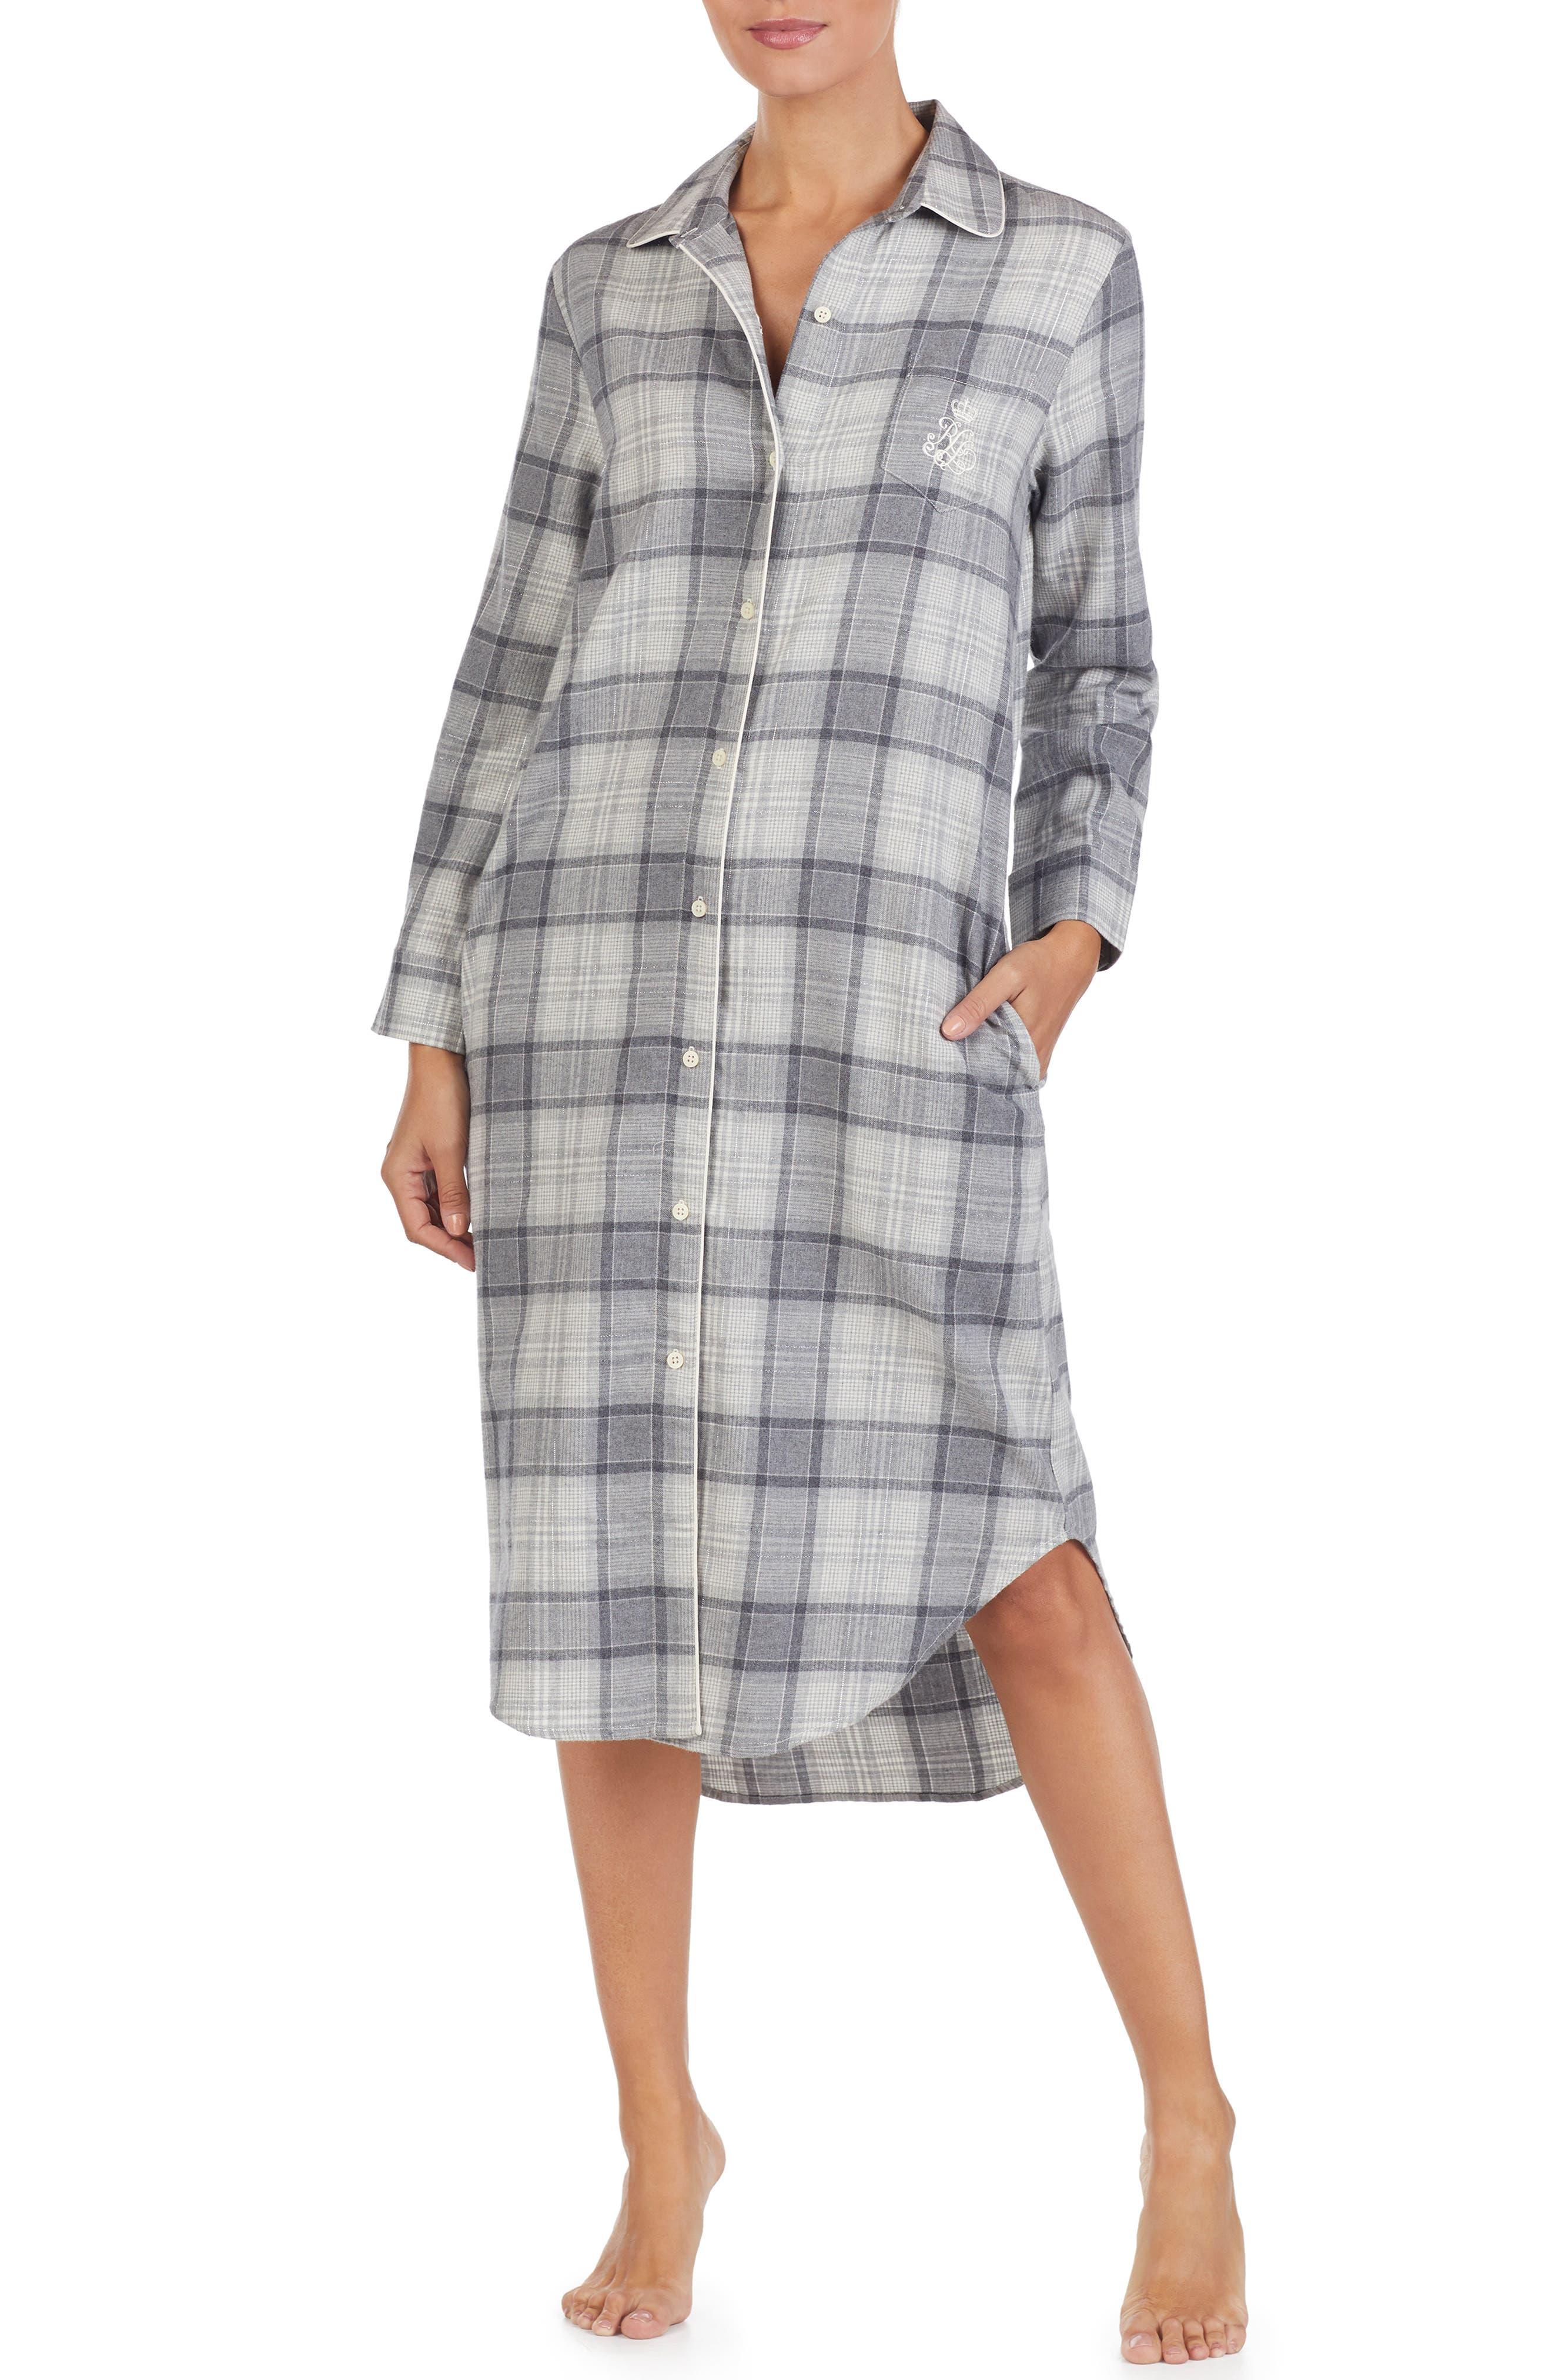 Plaid Flannel Sleep Shirt,                         Main,                         color, GREY PLAID